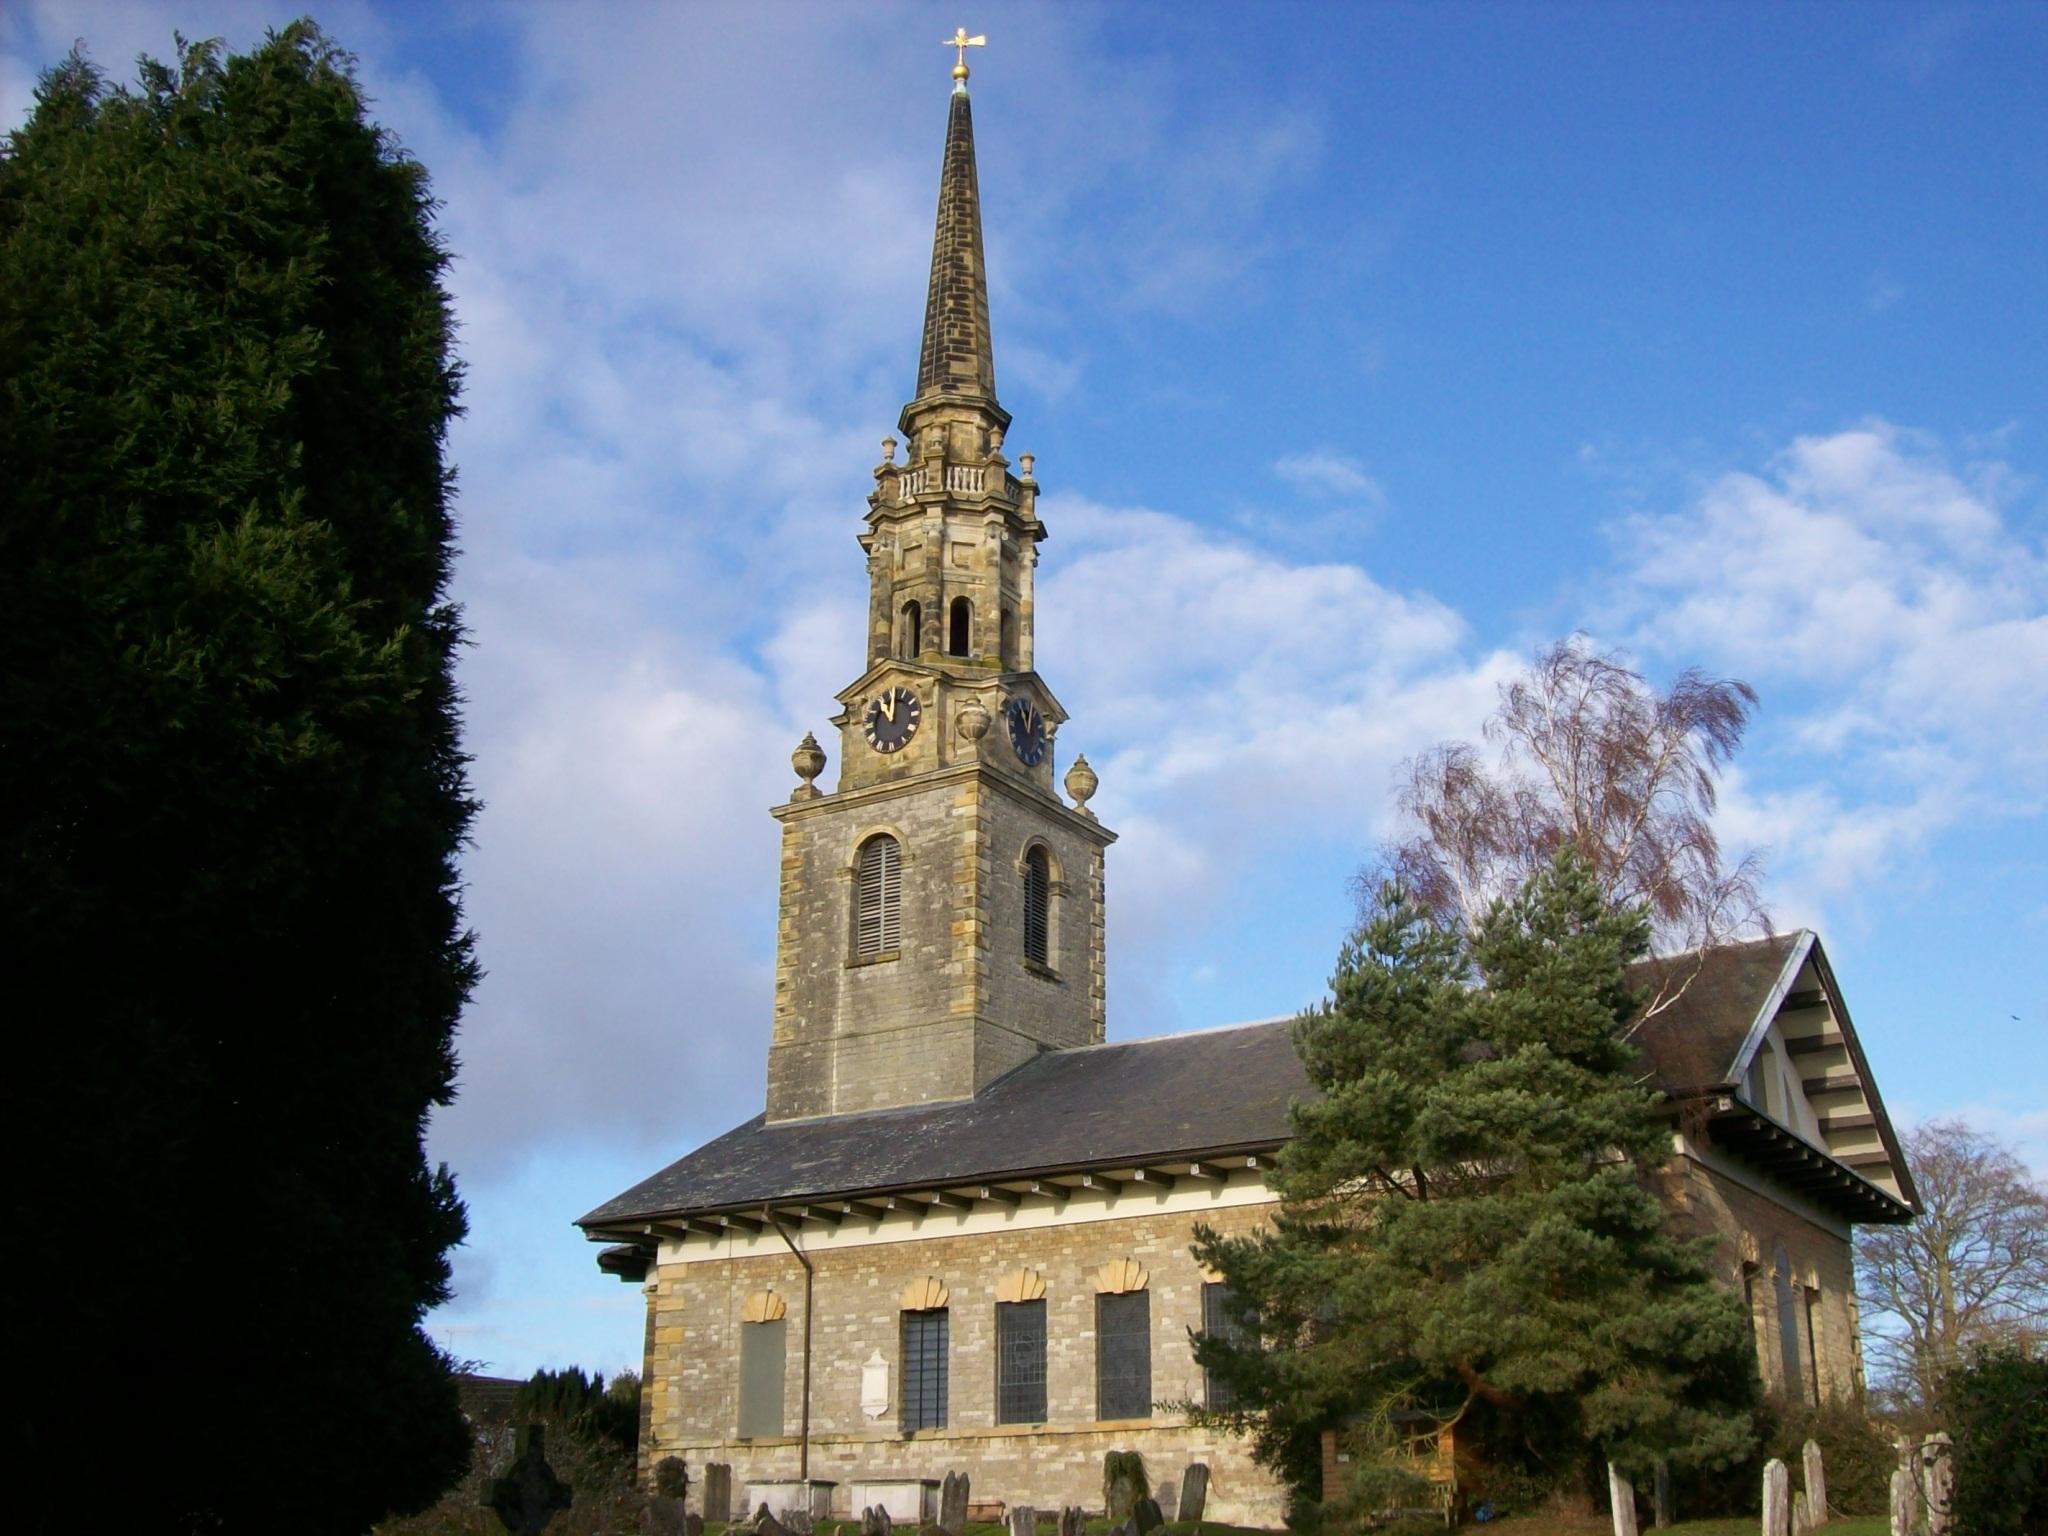 St Lawrence, Mereworth, Kent